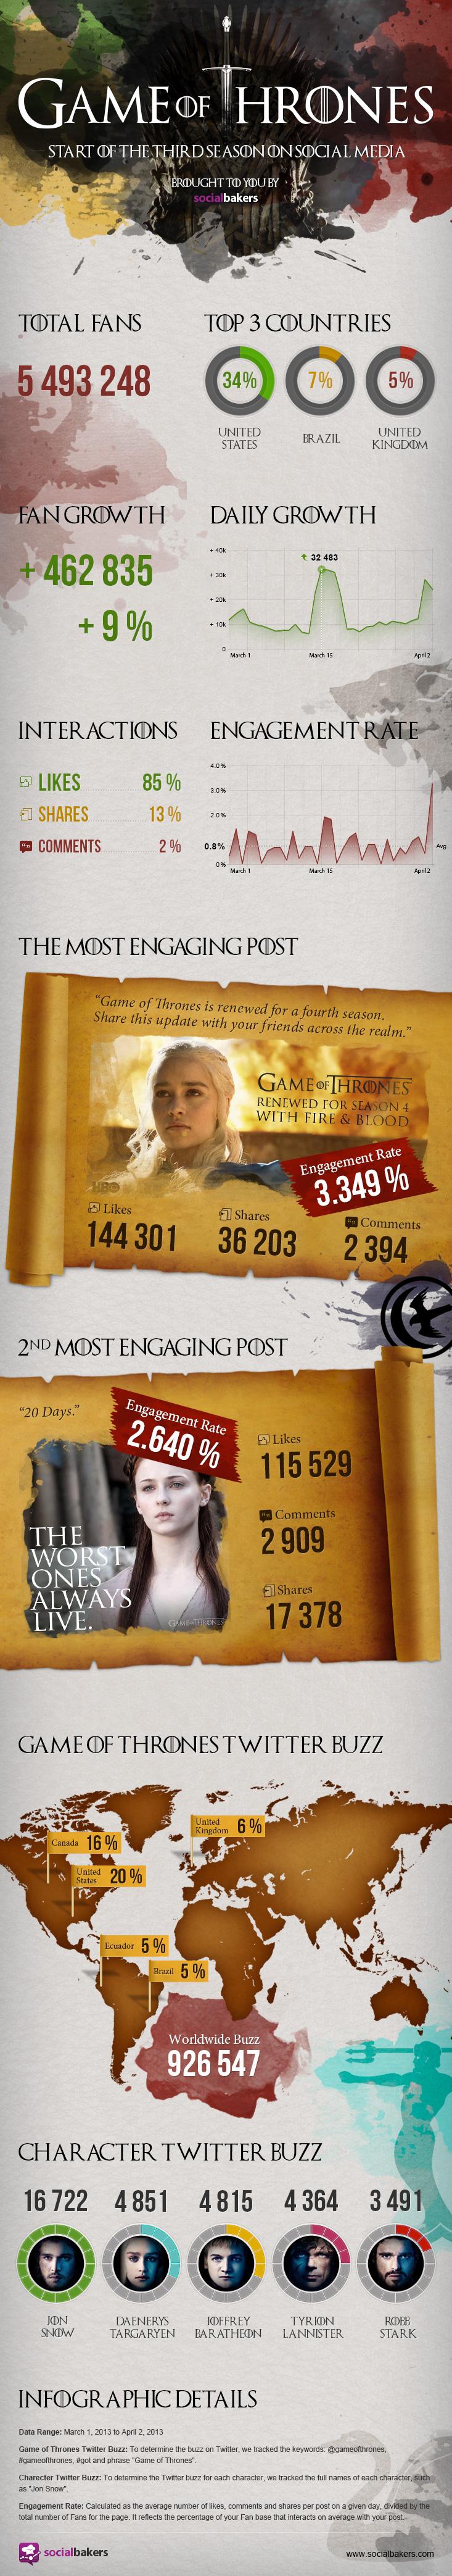 Infographie Game of Thrones Medias Sociaux